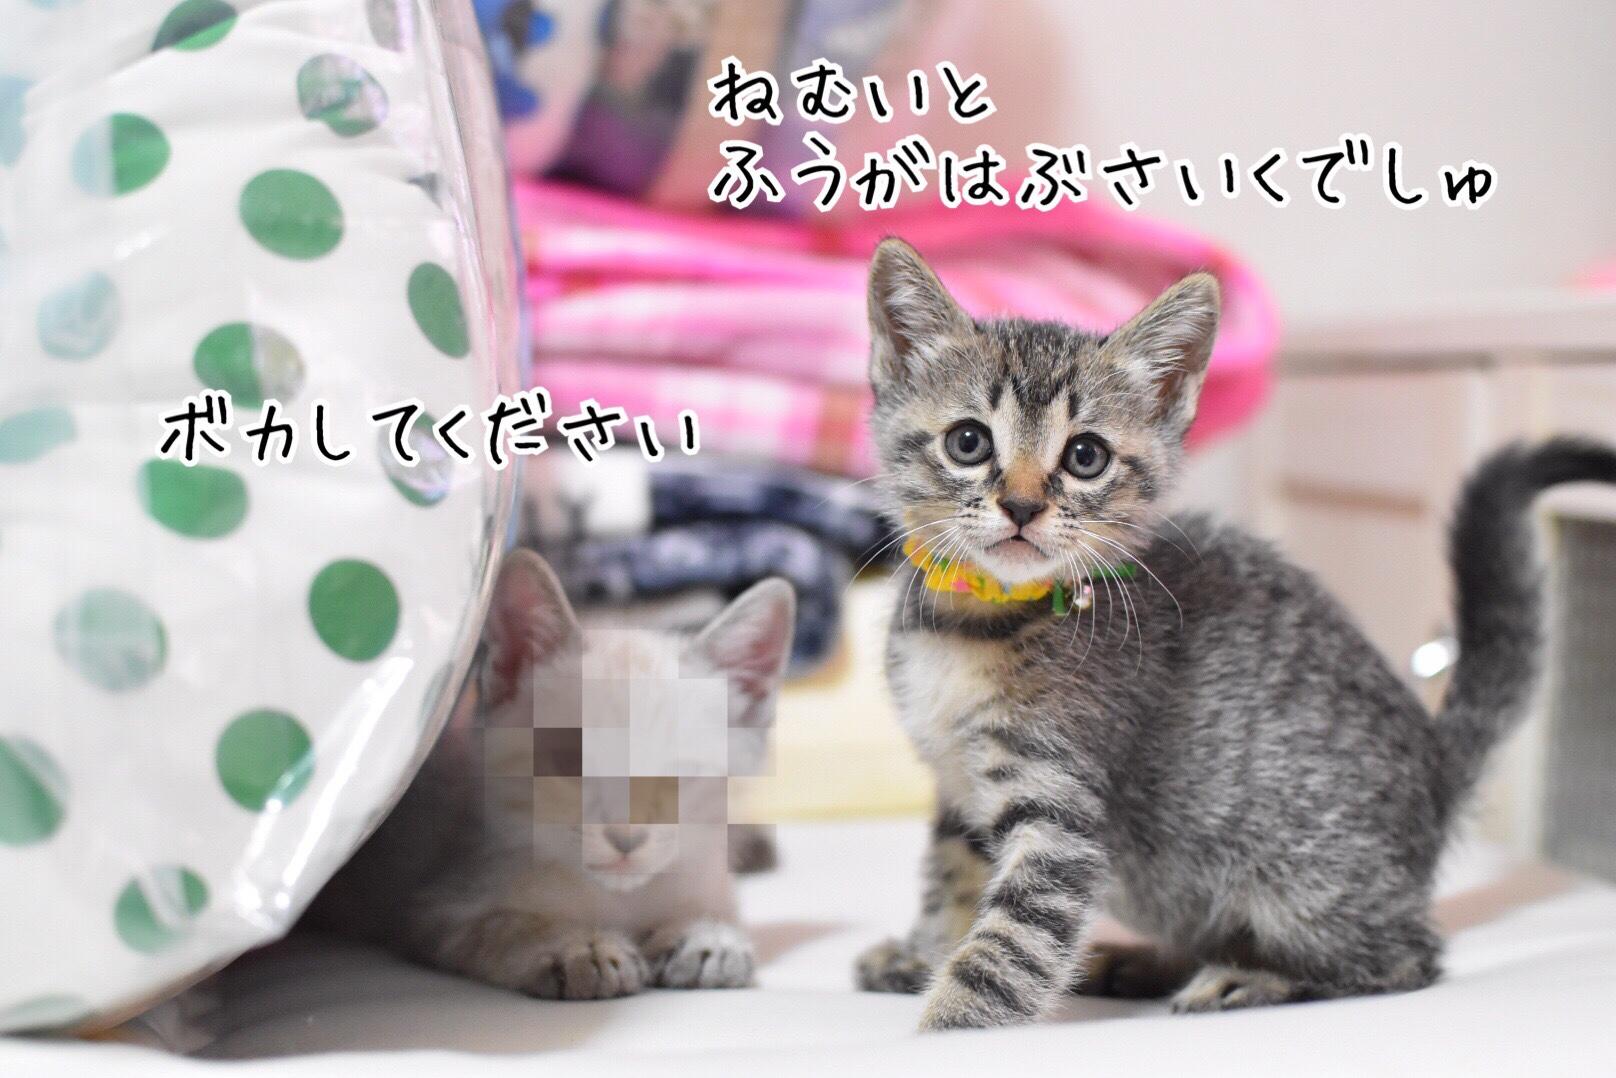 fc2blog_20181201210045316.jpg